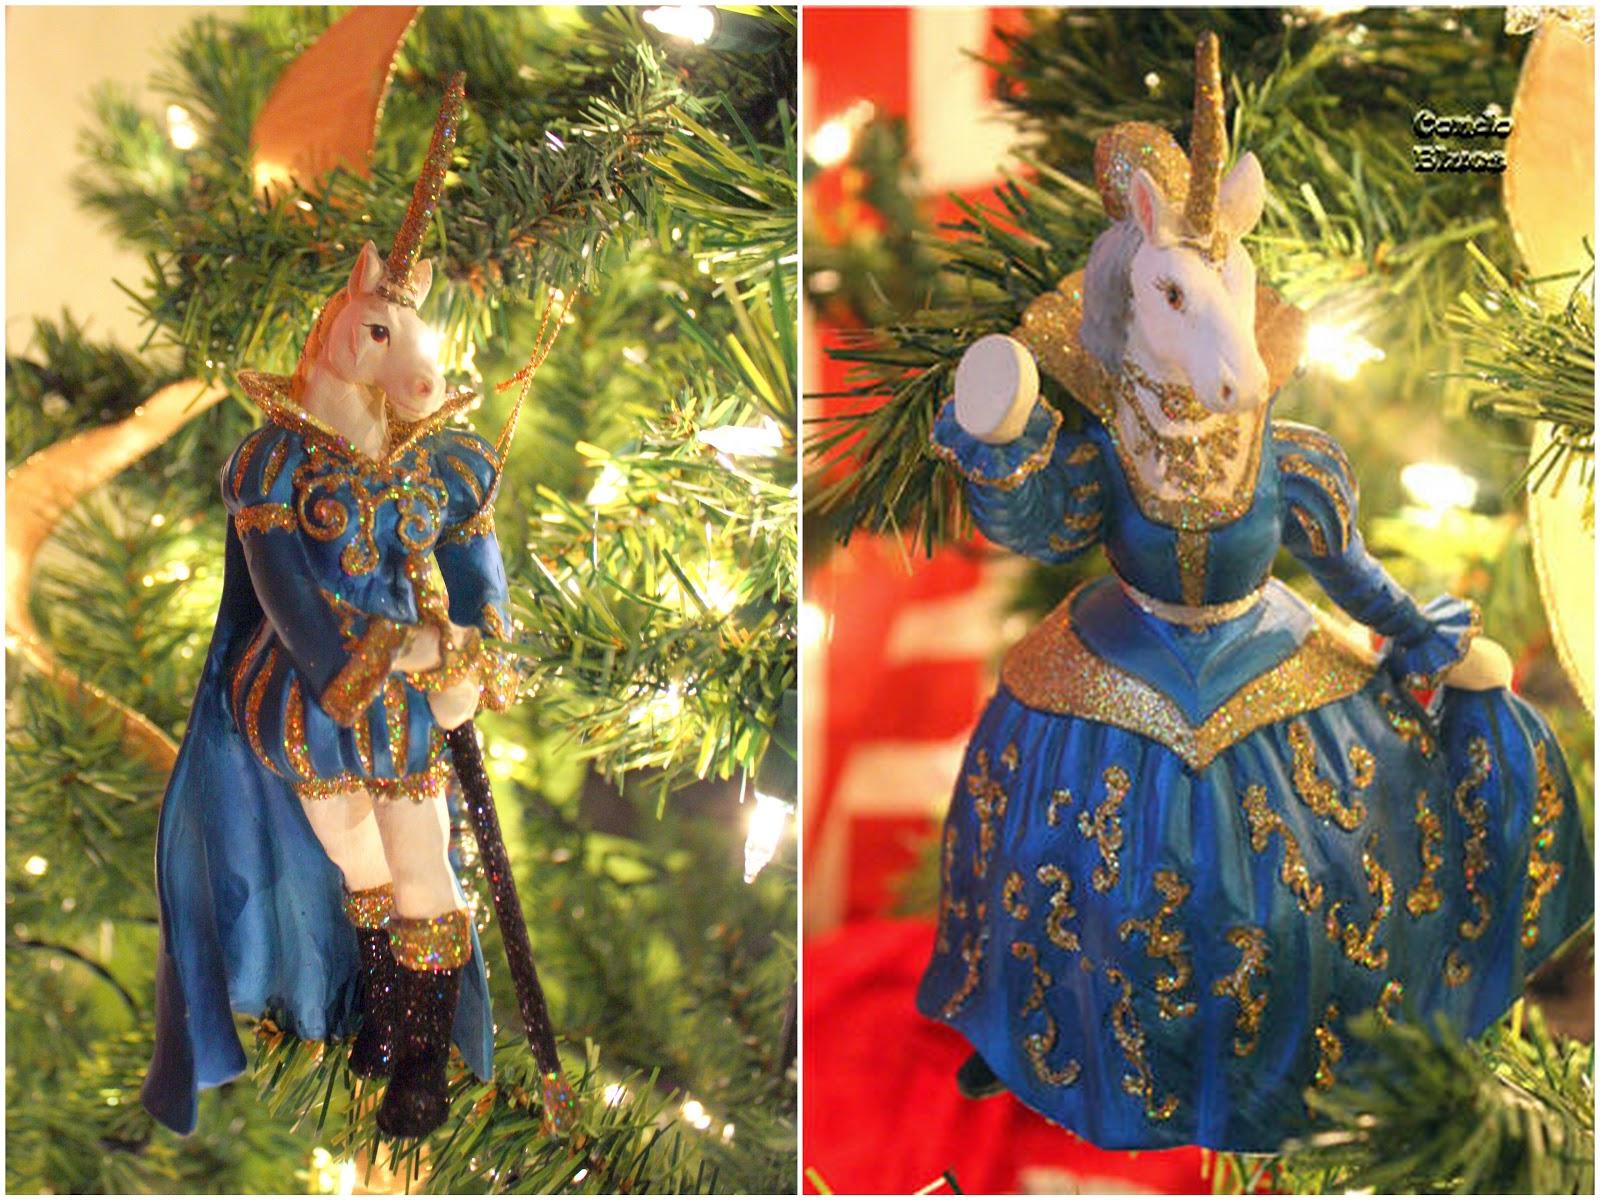 handmade photo ornament ideas - Condo Blues Renaissance Christmas Tree